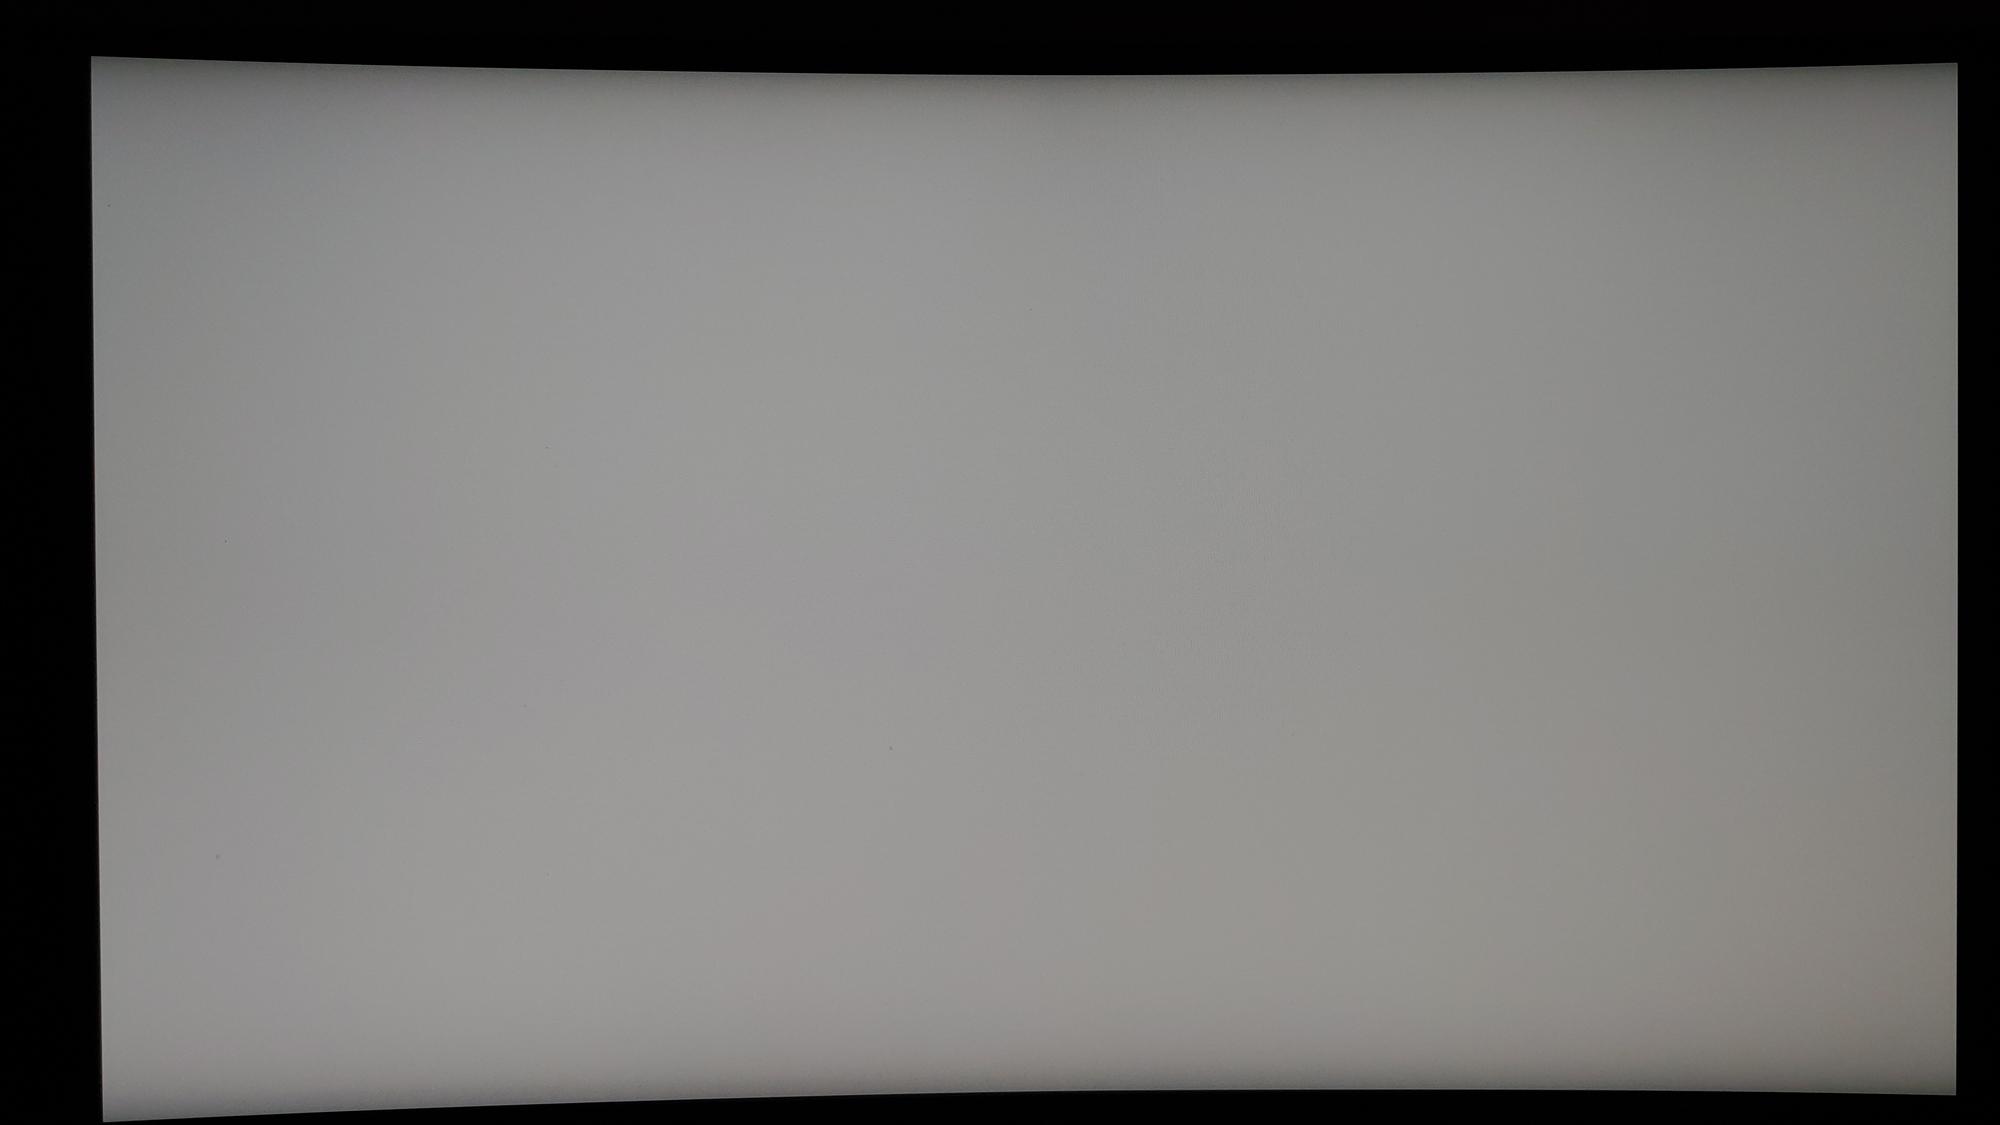 lgwhitescreen.jpg